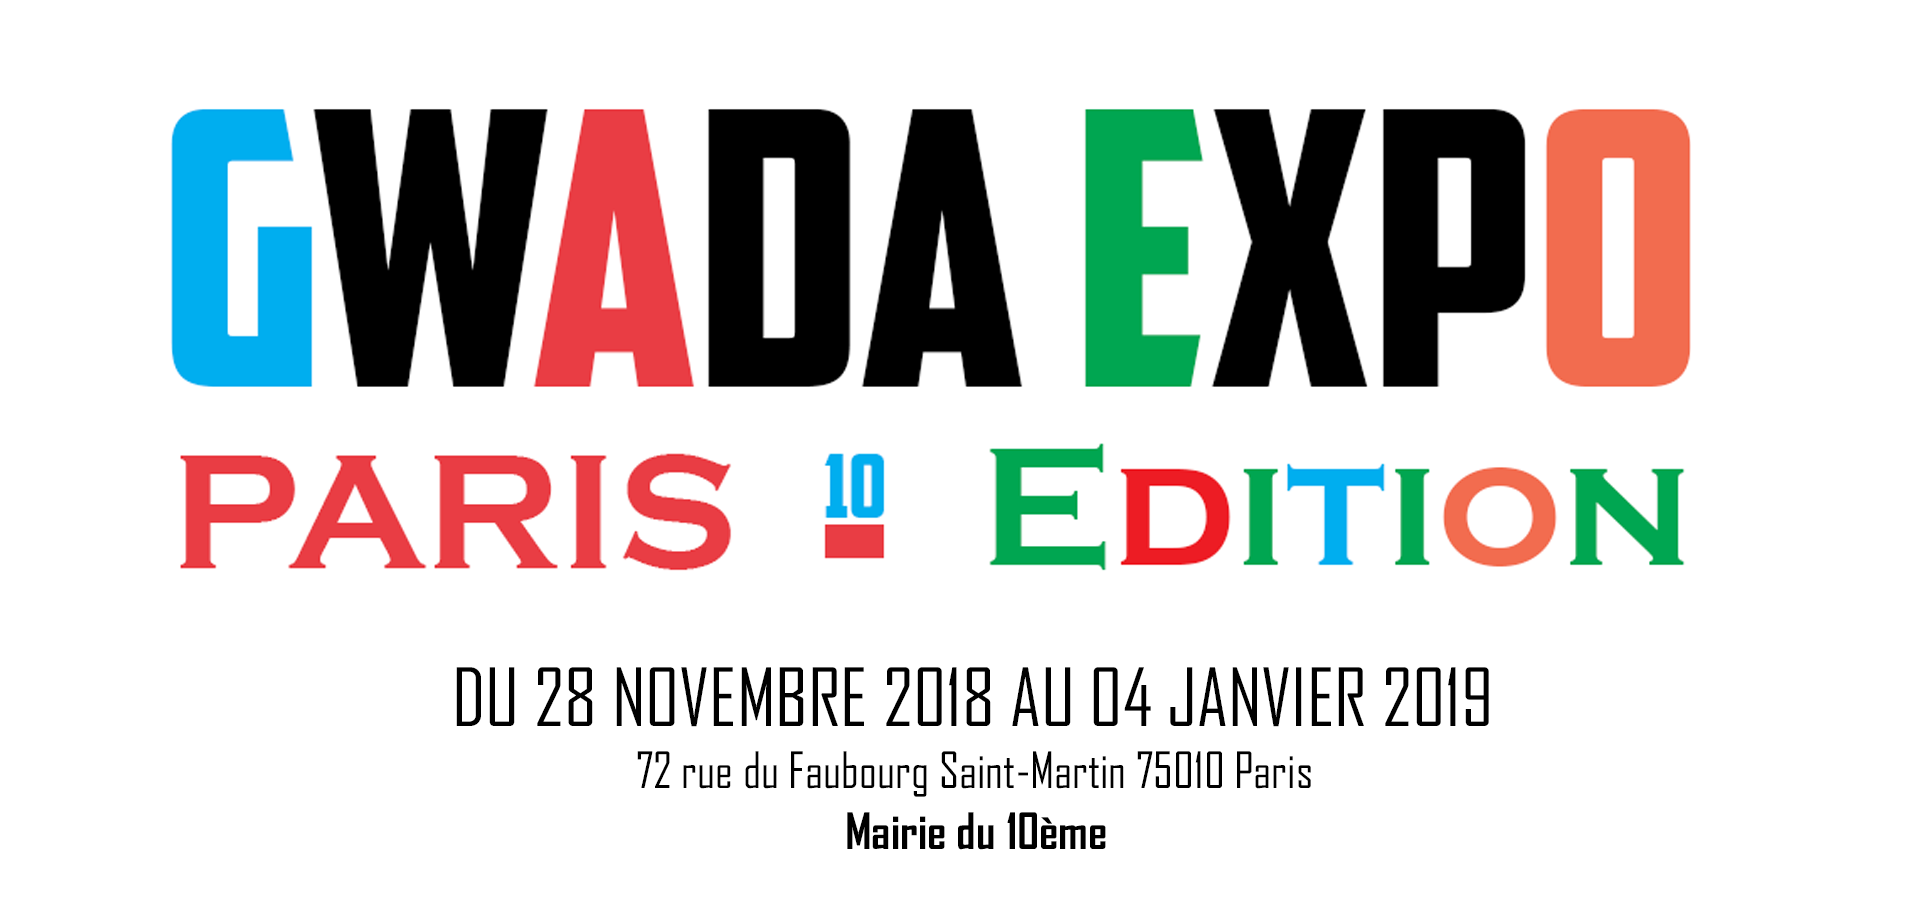 Gwada expo / Paris edition 28 novembre 2018 au 4 janvier 2019